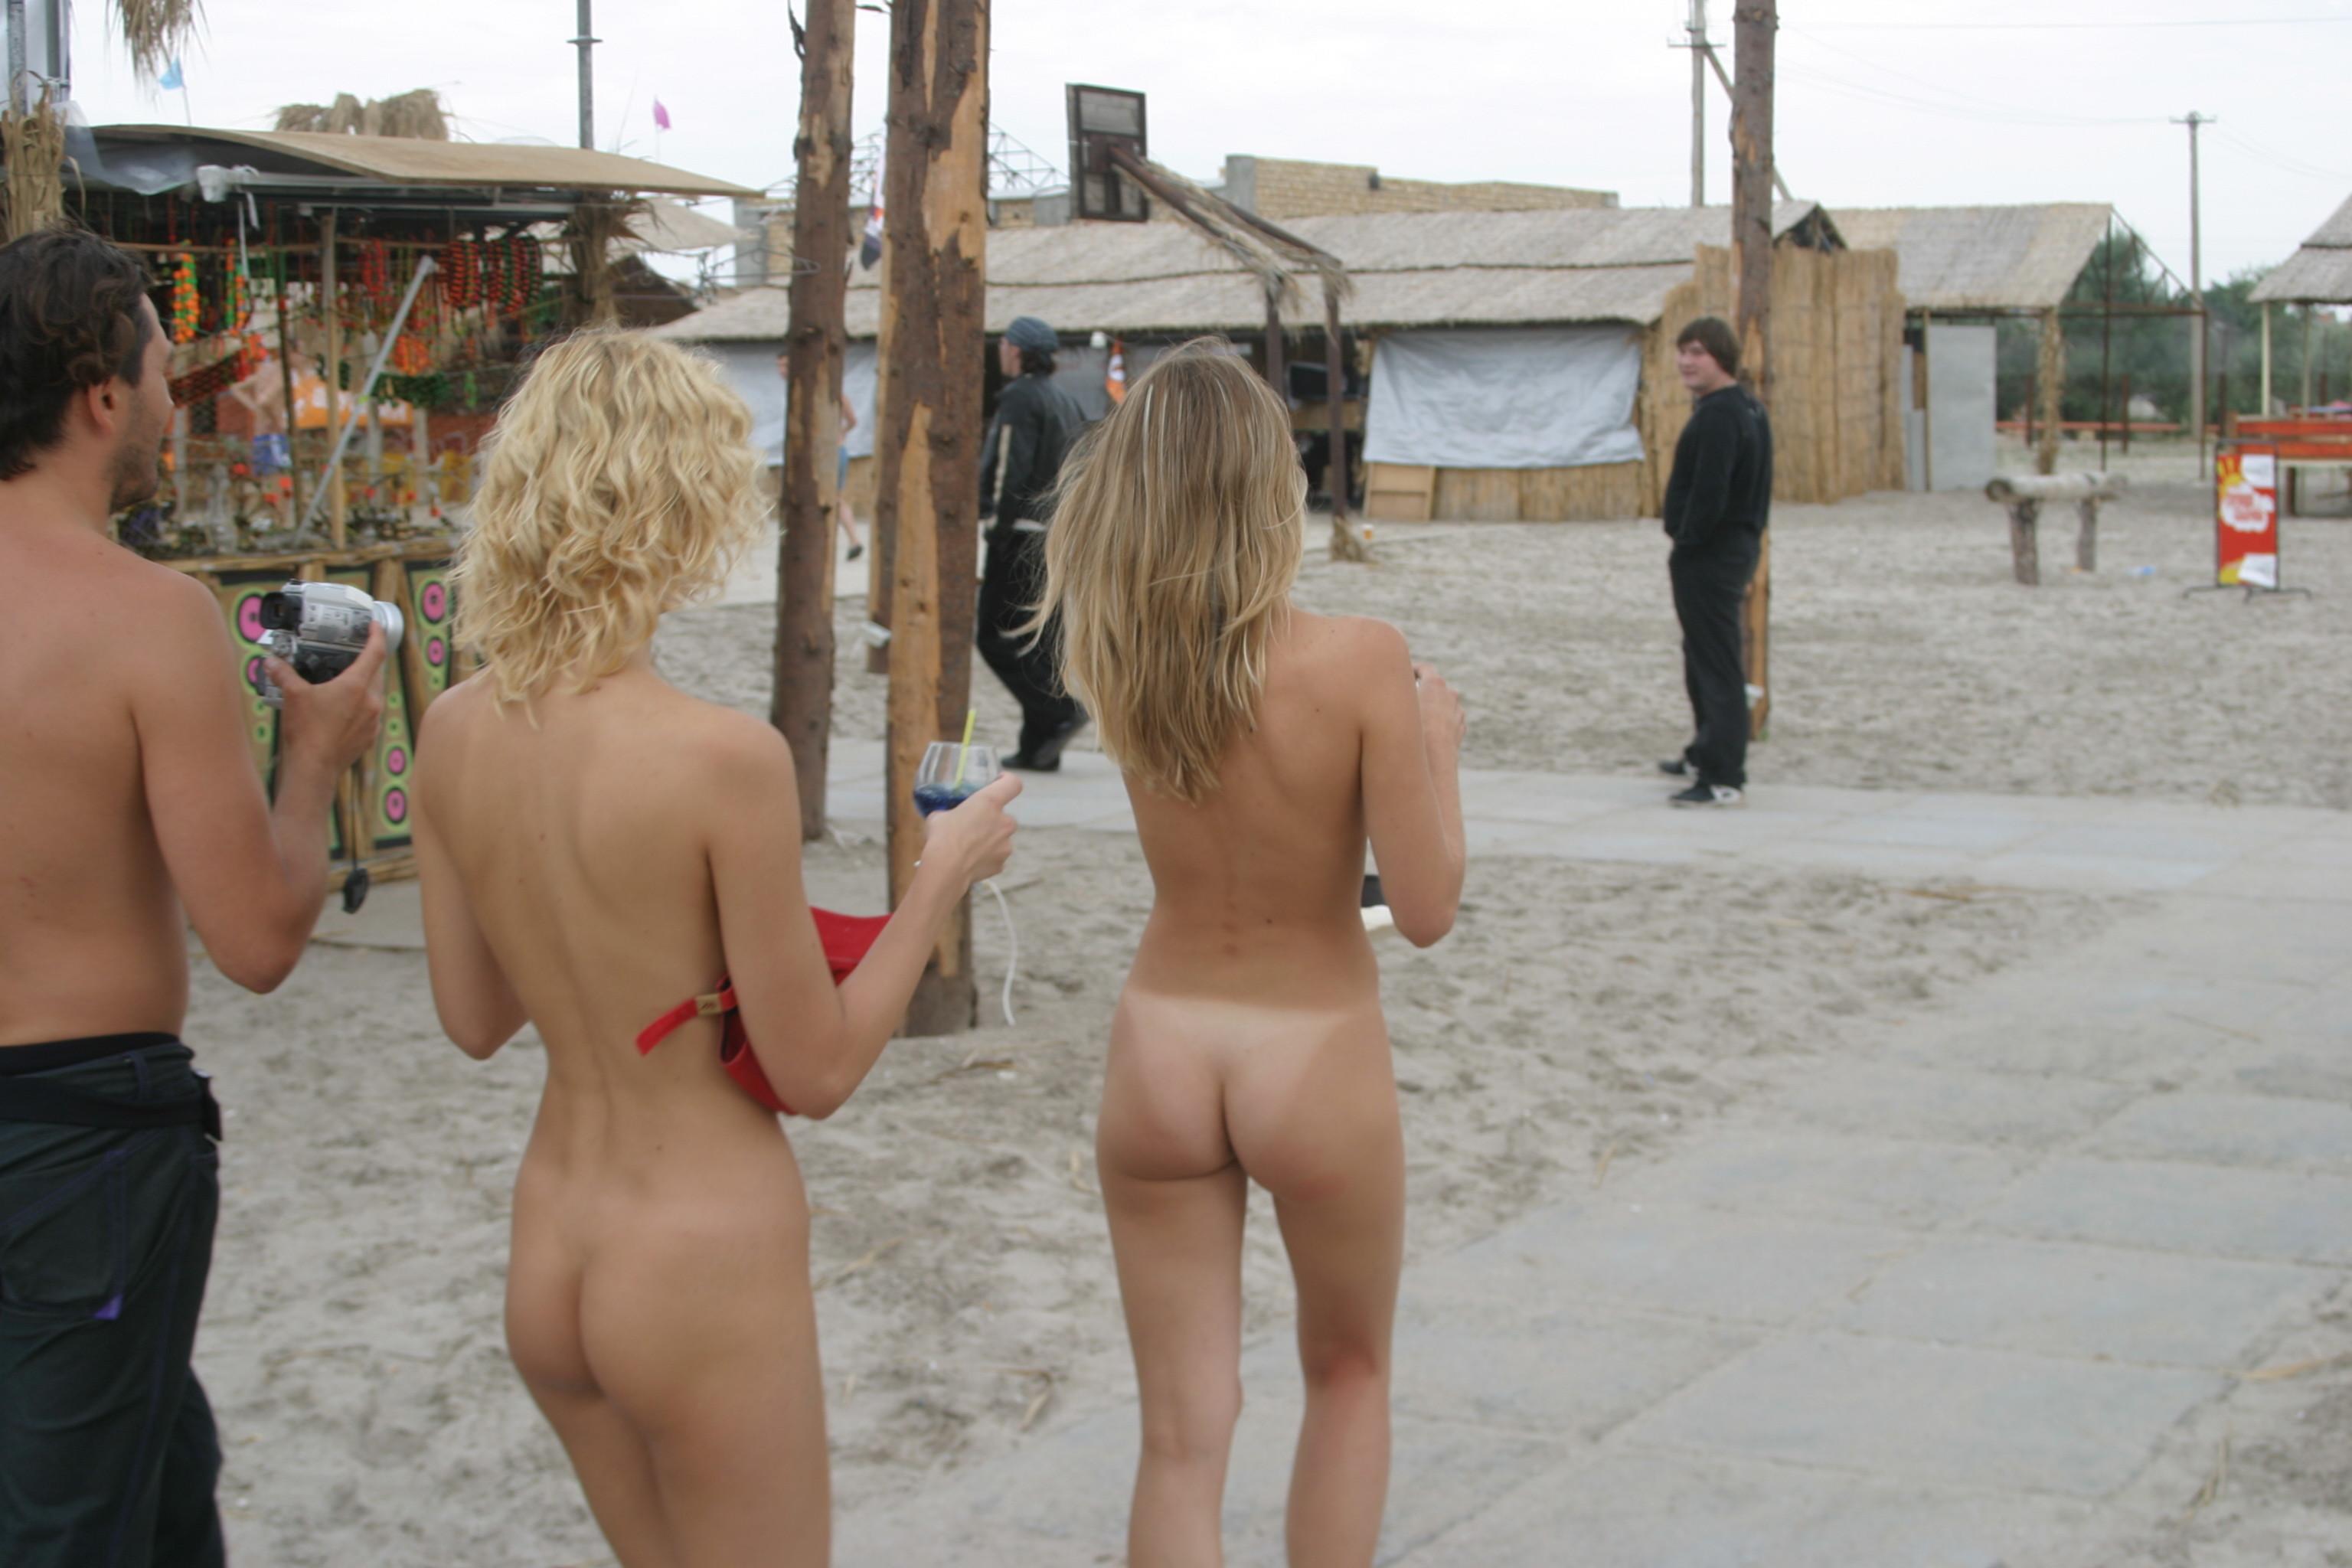 vika-y-lena-l-beach-nude-in-public-metart-51